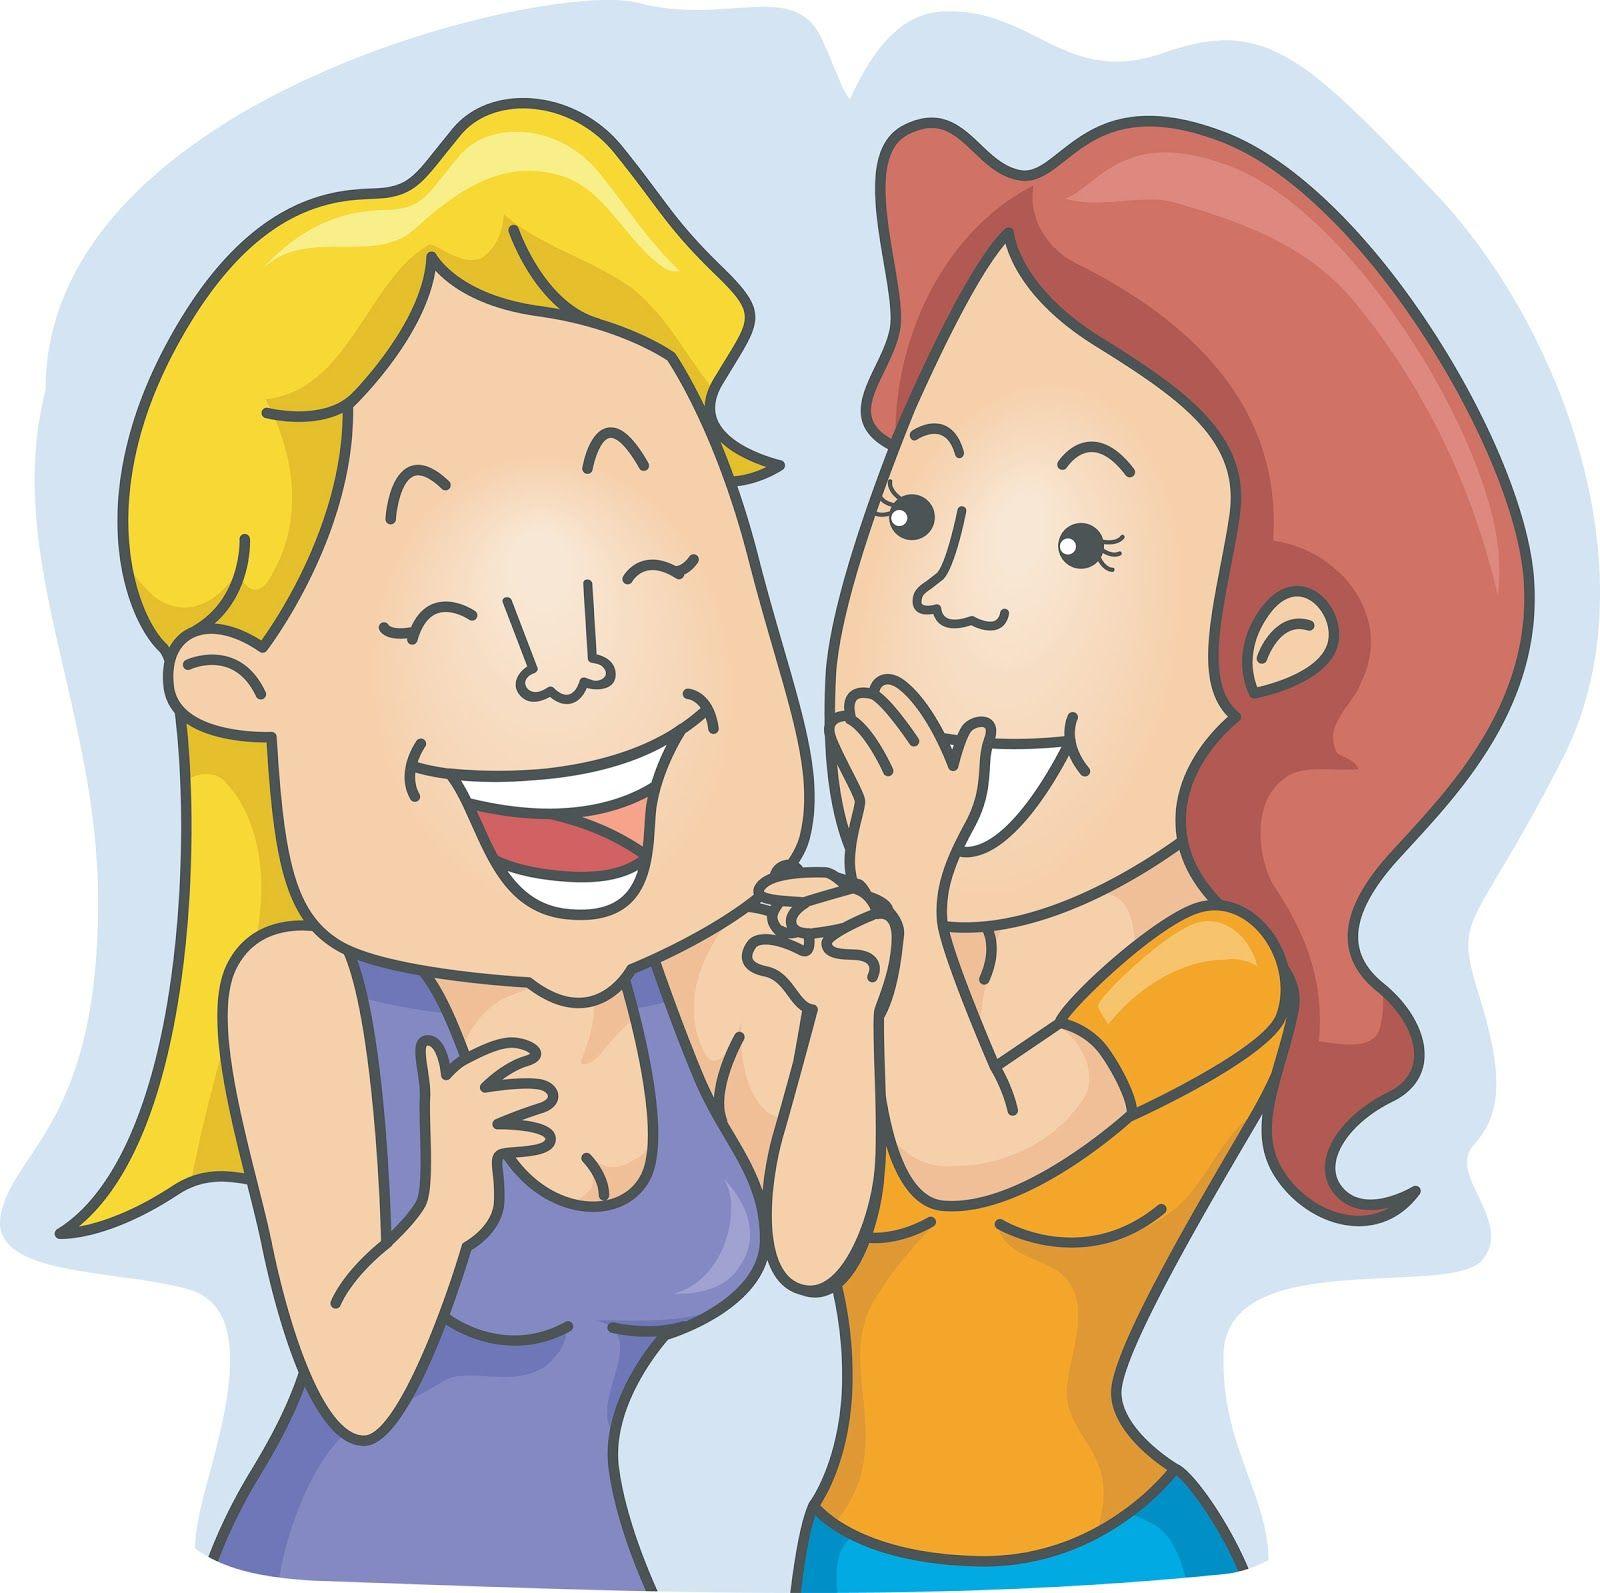 book talk clipart google search cliparts for school pinterest rh pinterest com talk show clipart don't talk clipart